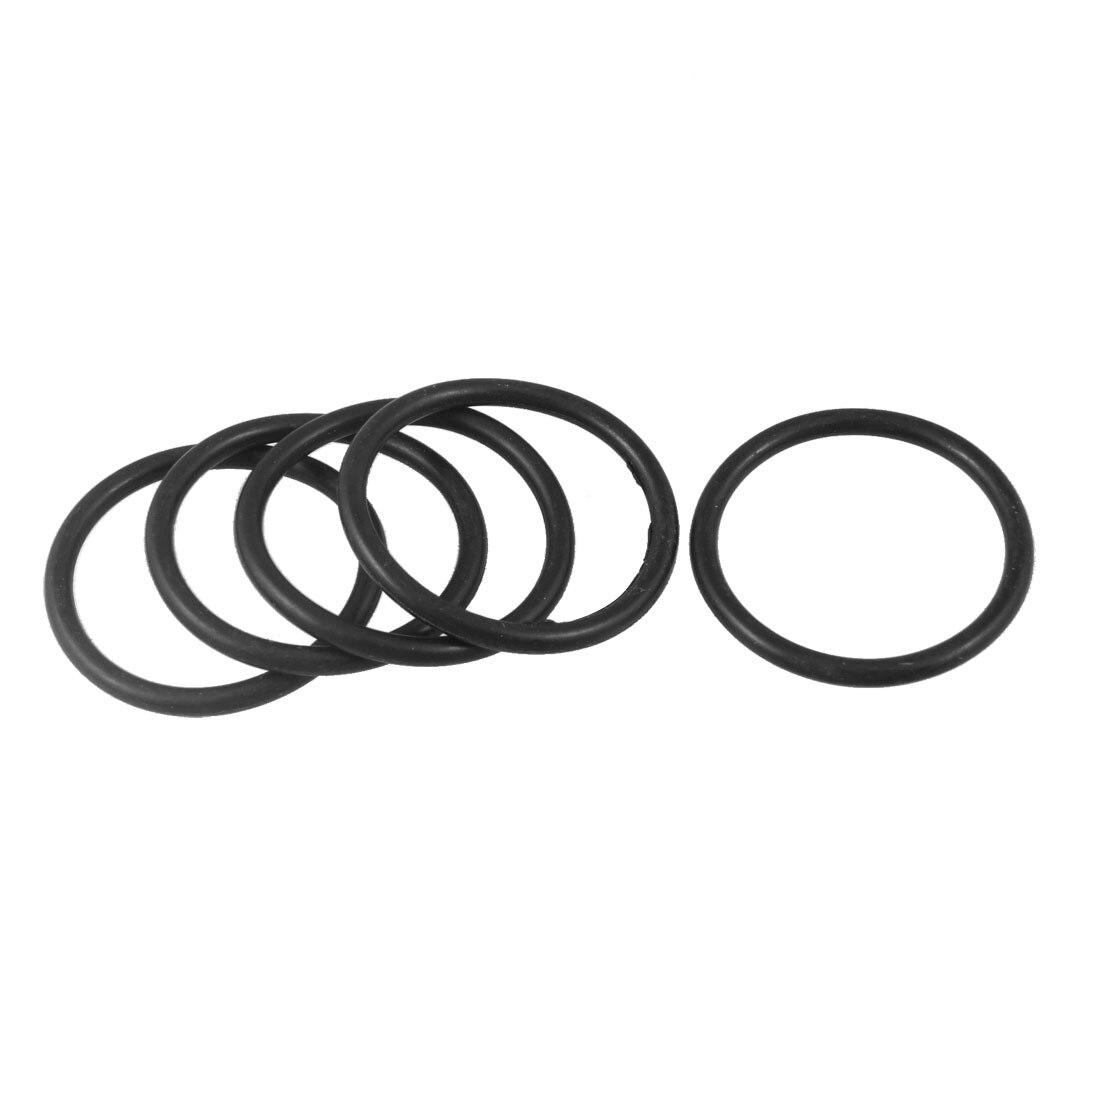 O-Rings Nitrile Rubber 3.5mm x 6.5mm x 1.5mm Seal Rings Sealing Gasket 50pcs